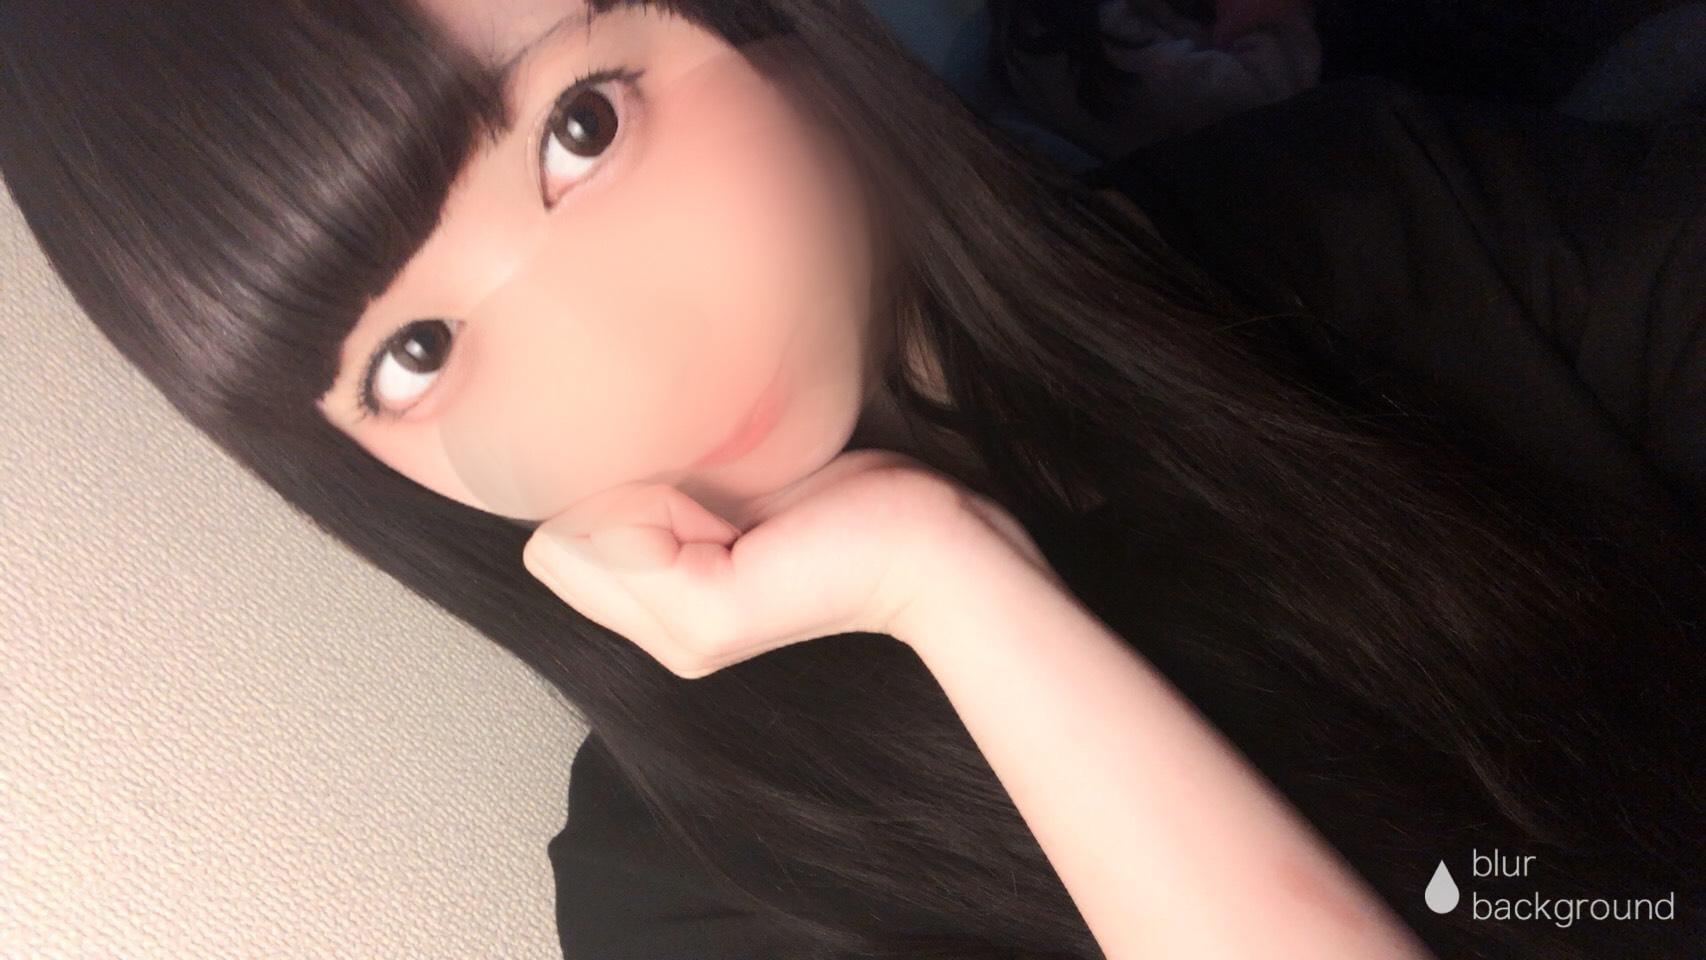 「Re: お礼」10/04(木) 07:11 | さなの写メ・風俗動画